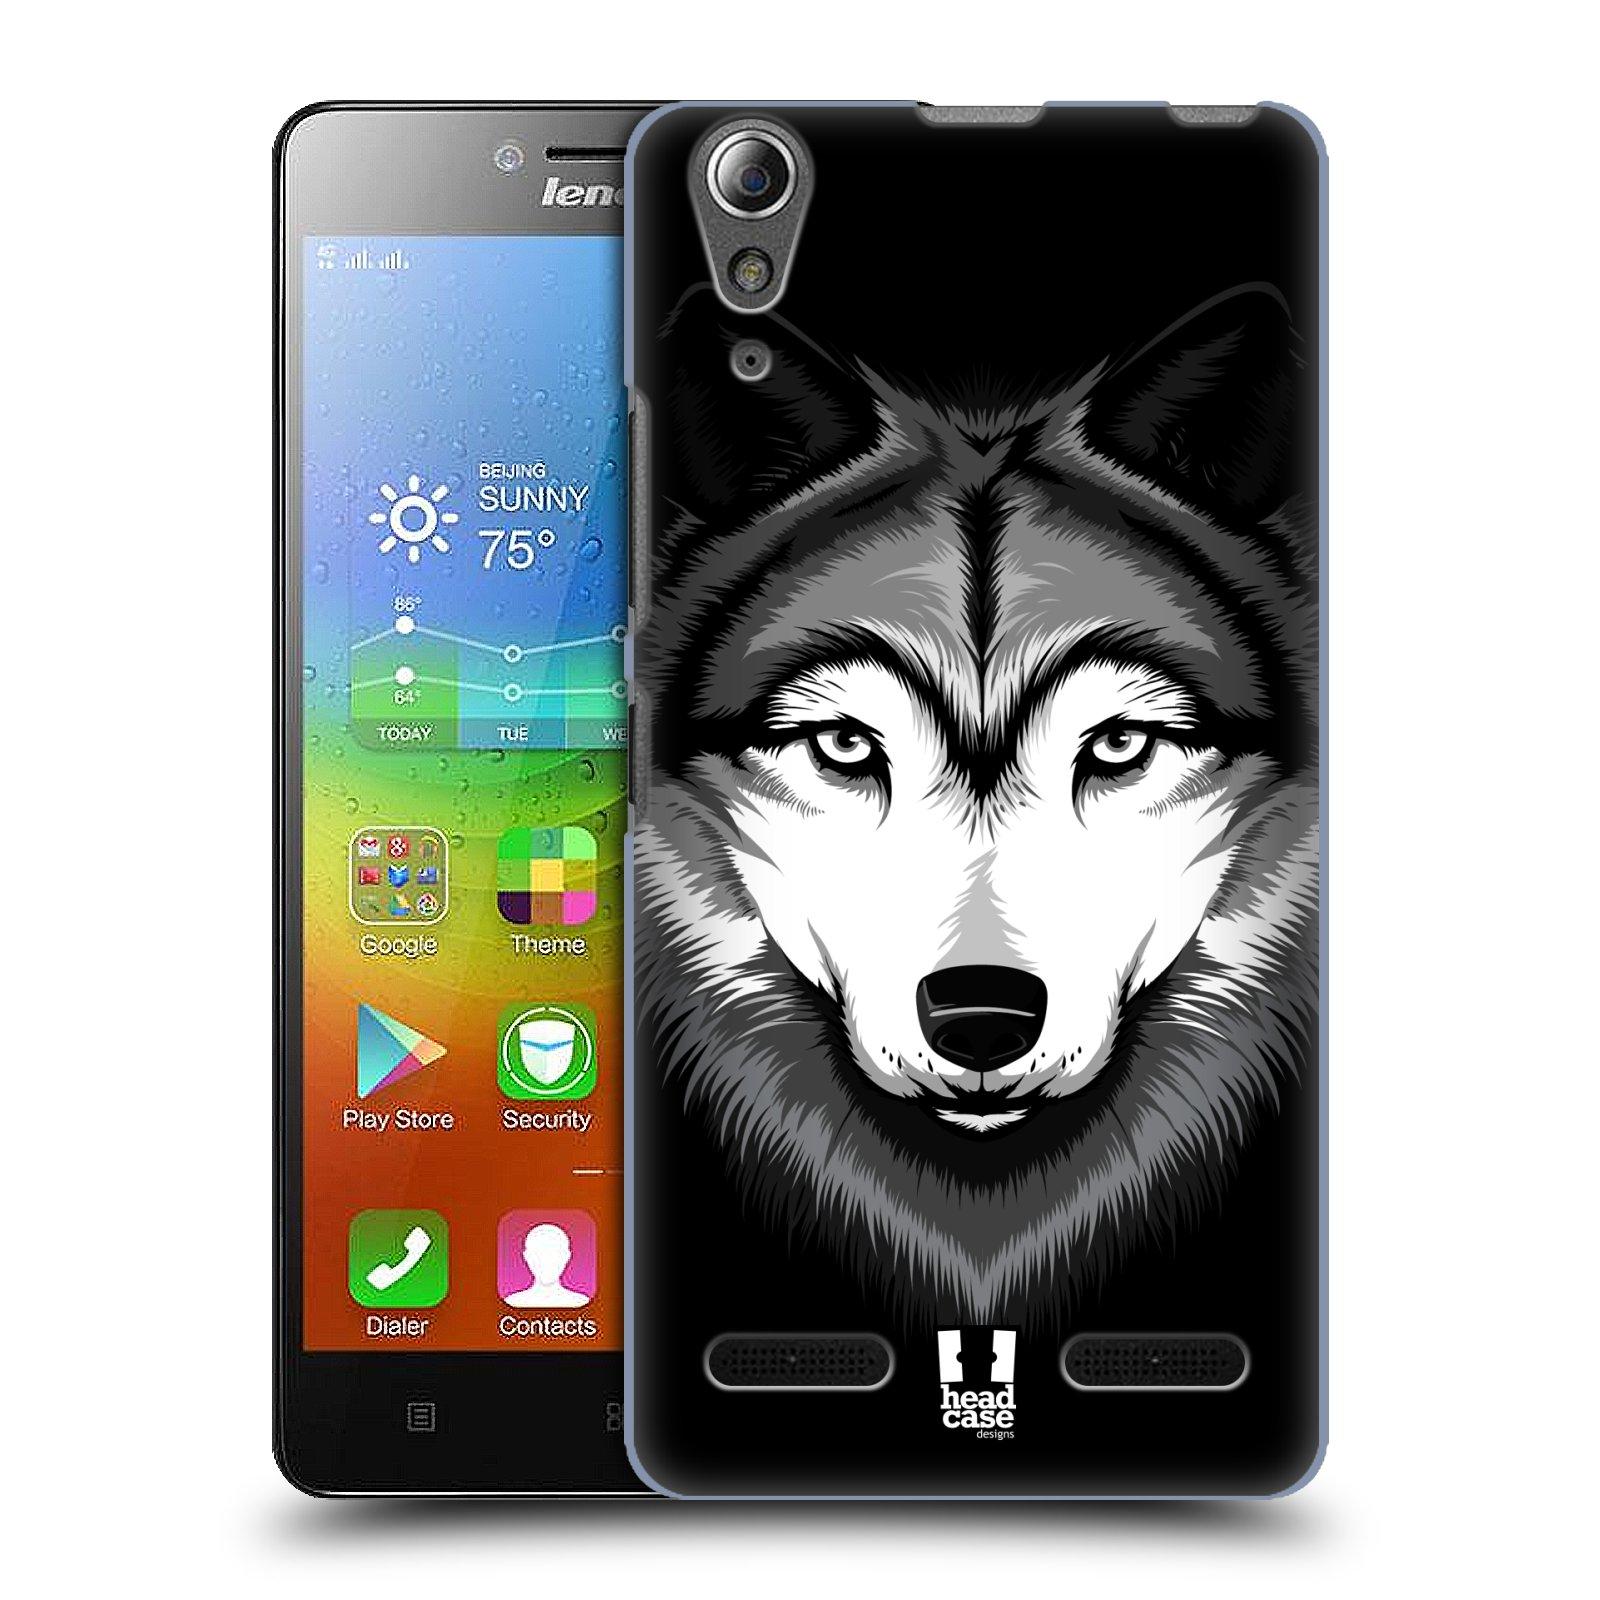 HEAD CASE pevný plastový obal na mobil LENOVO A6000 / A6000 PLUS vzor Zvíře kreslená tvář 2 vlk